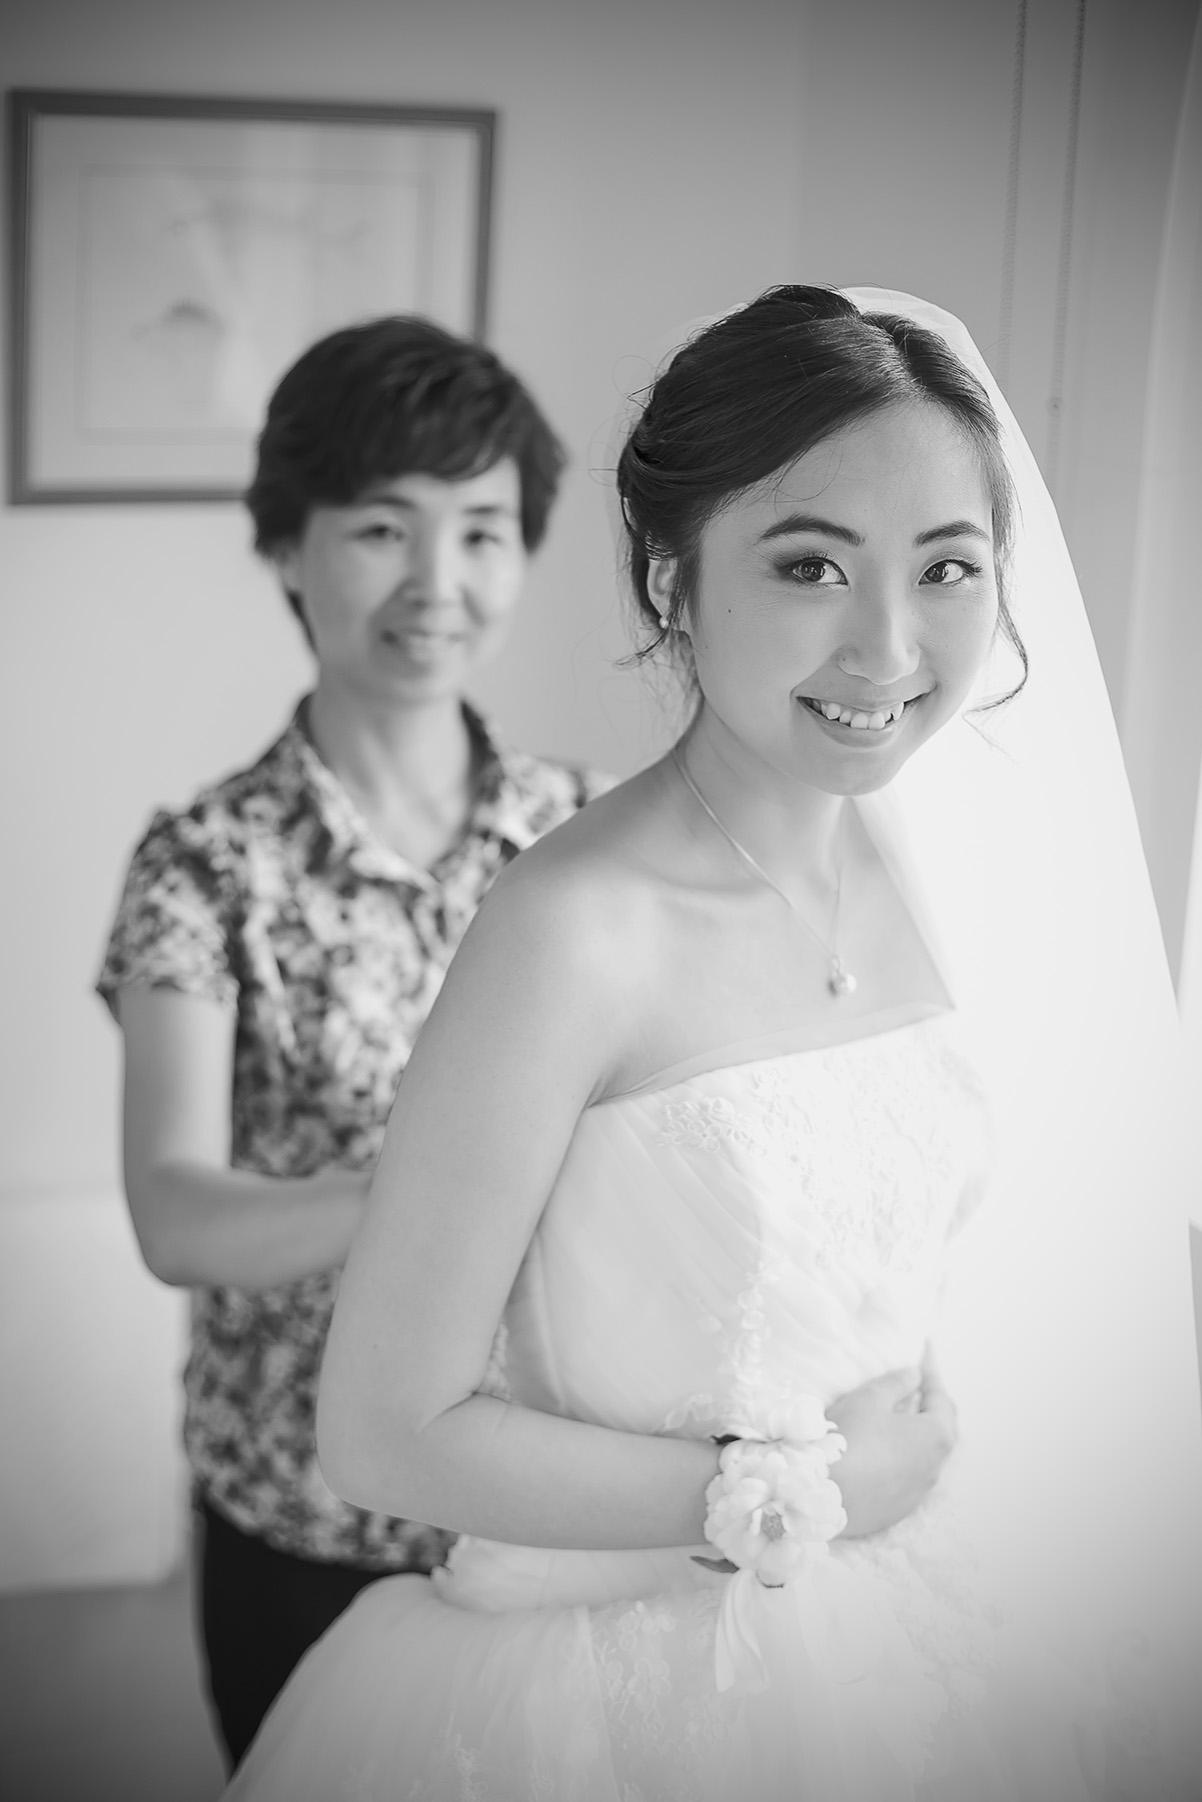 Black and White Film Style Bridal Preparation photo 5